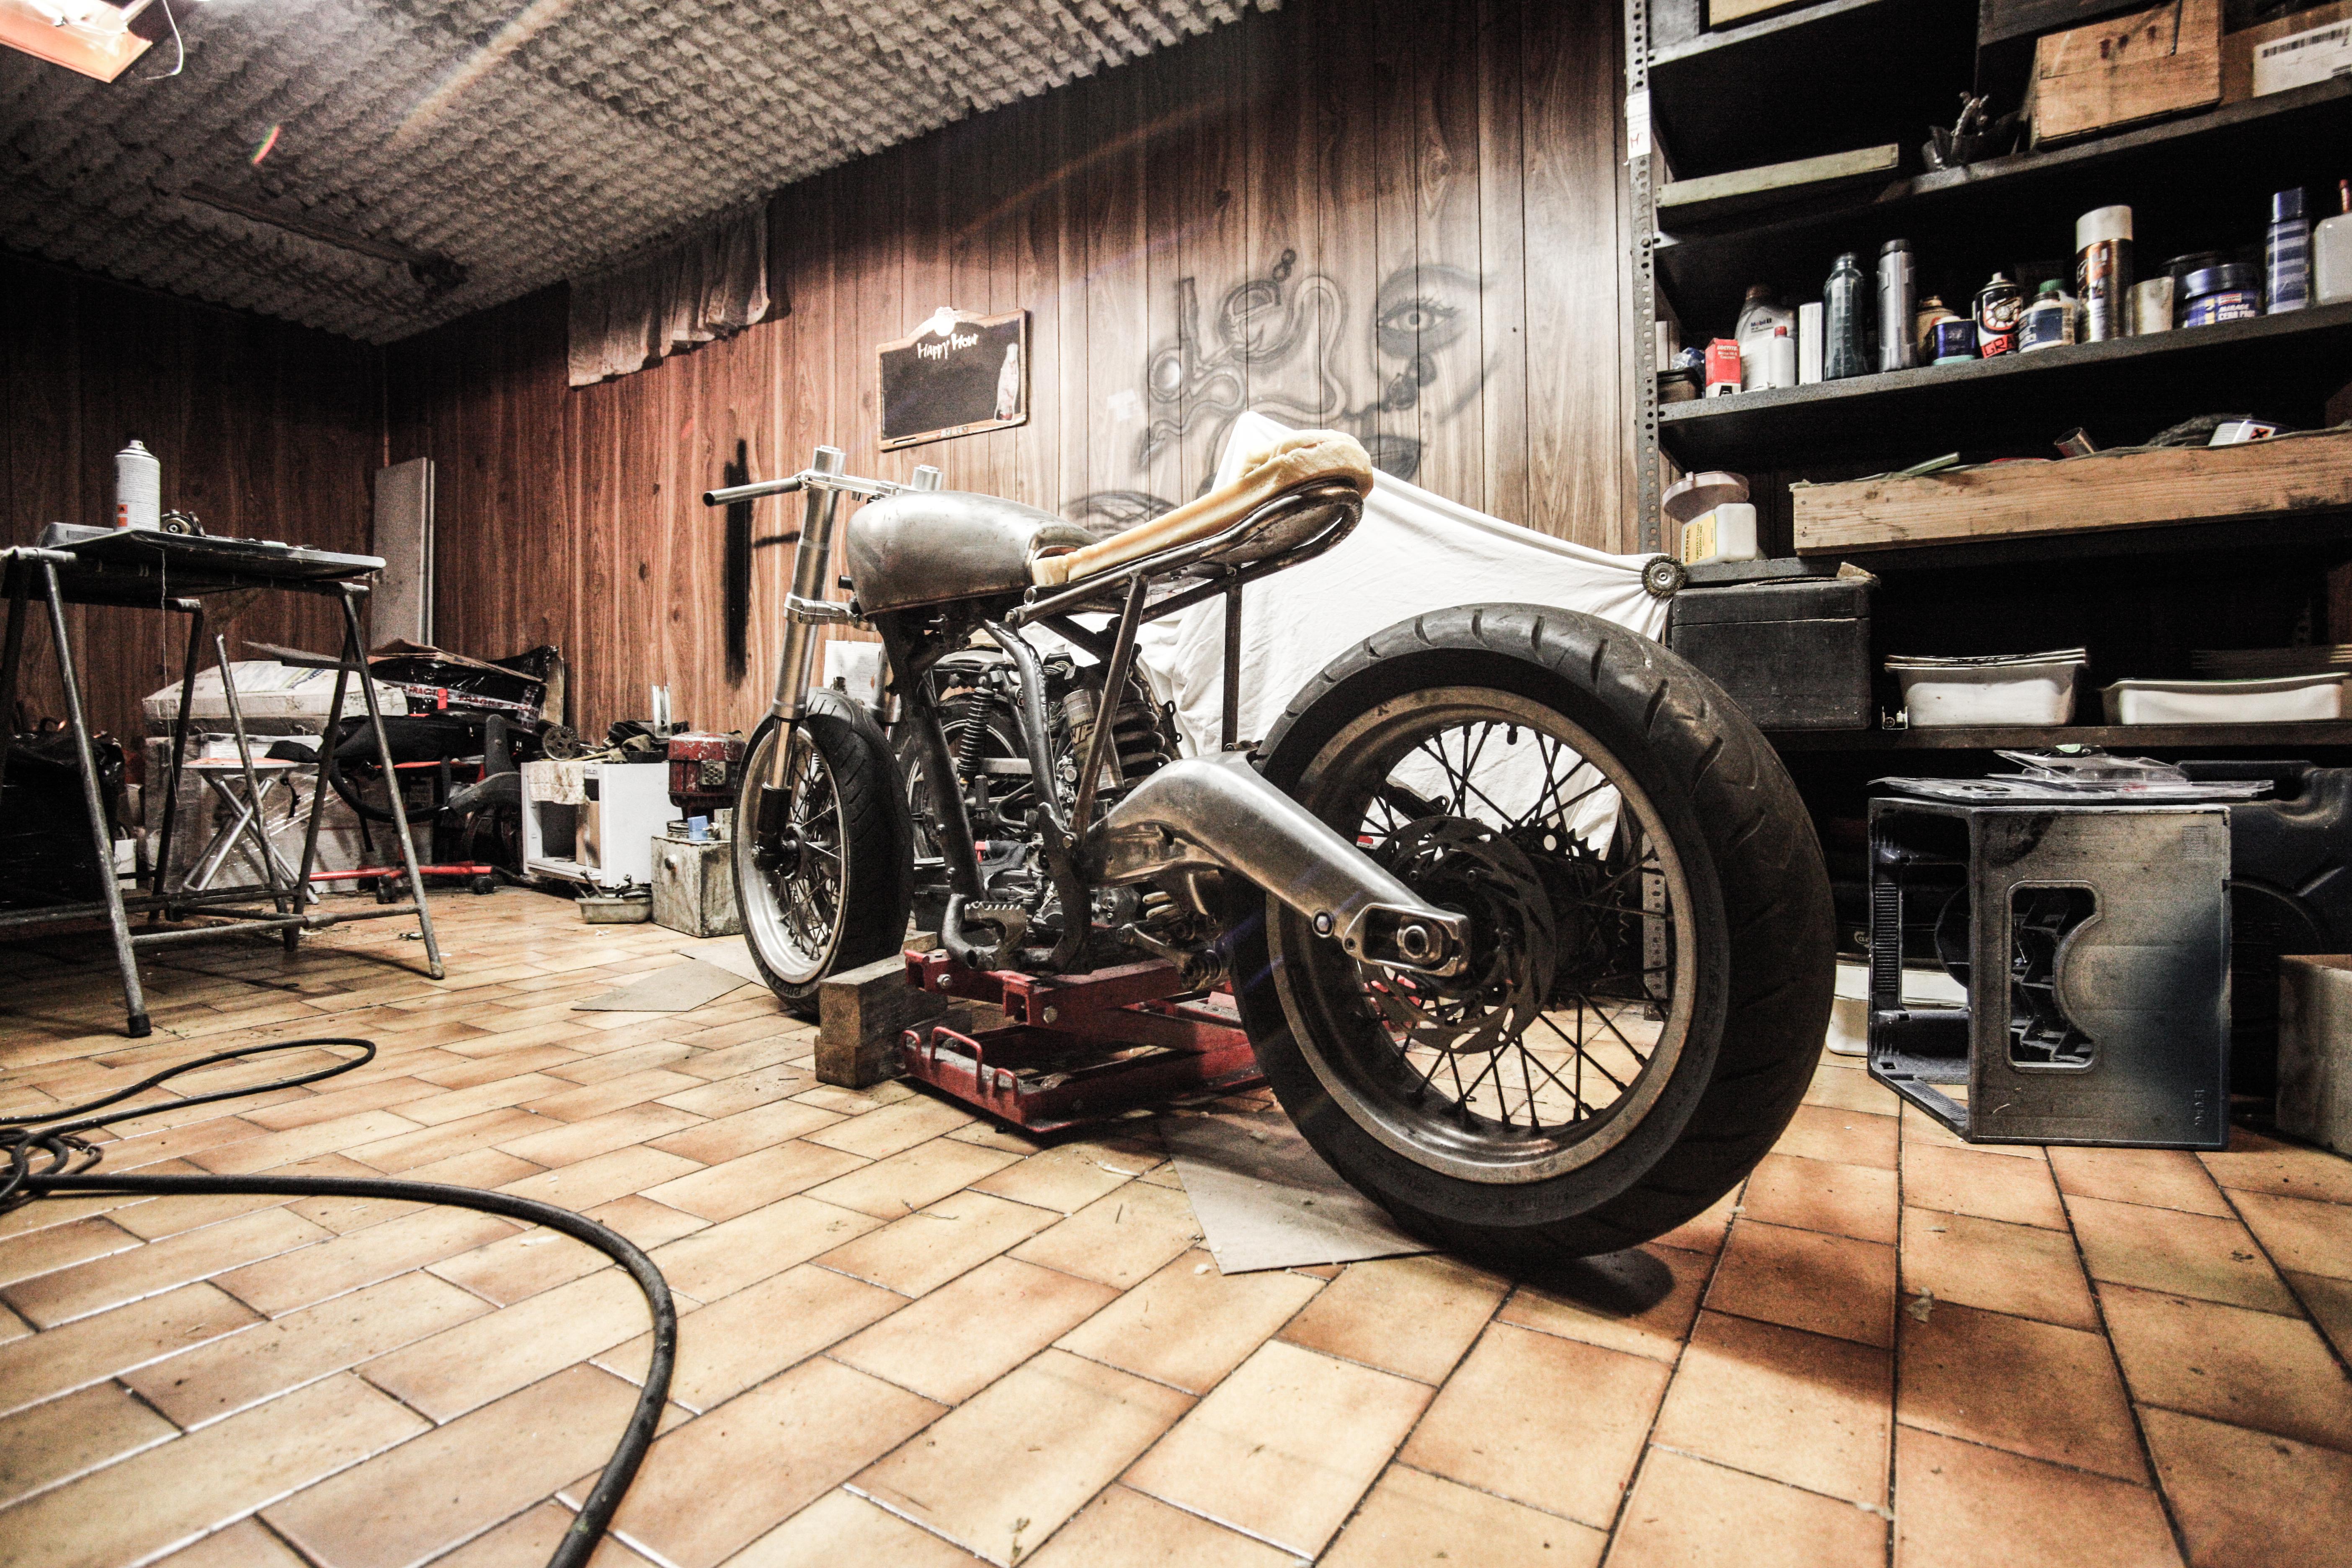 free motorcycle frame  Free Images : car, wheel, bicycle, workshop, motorcycle, frame ...